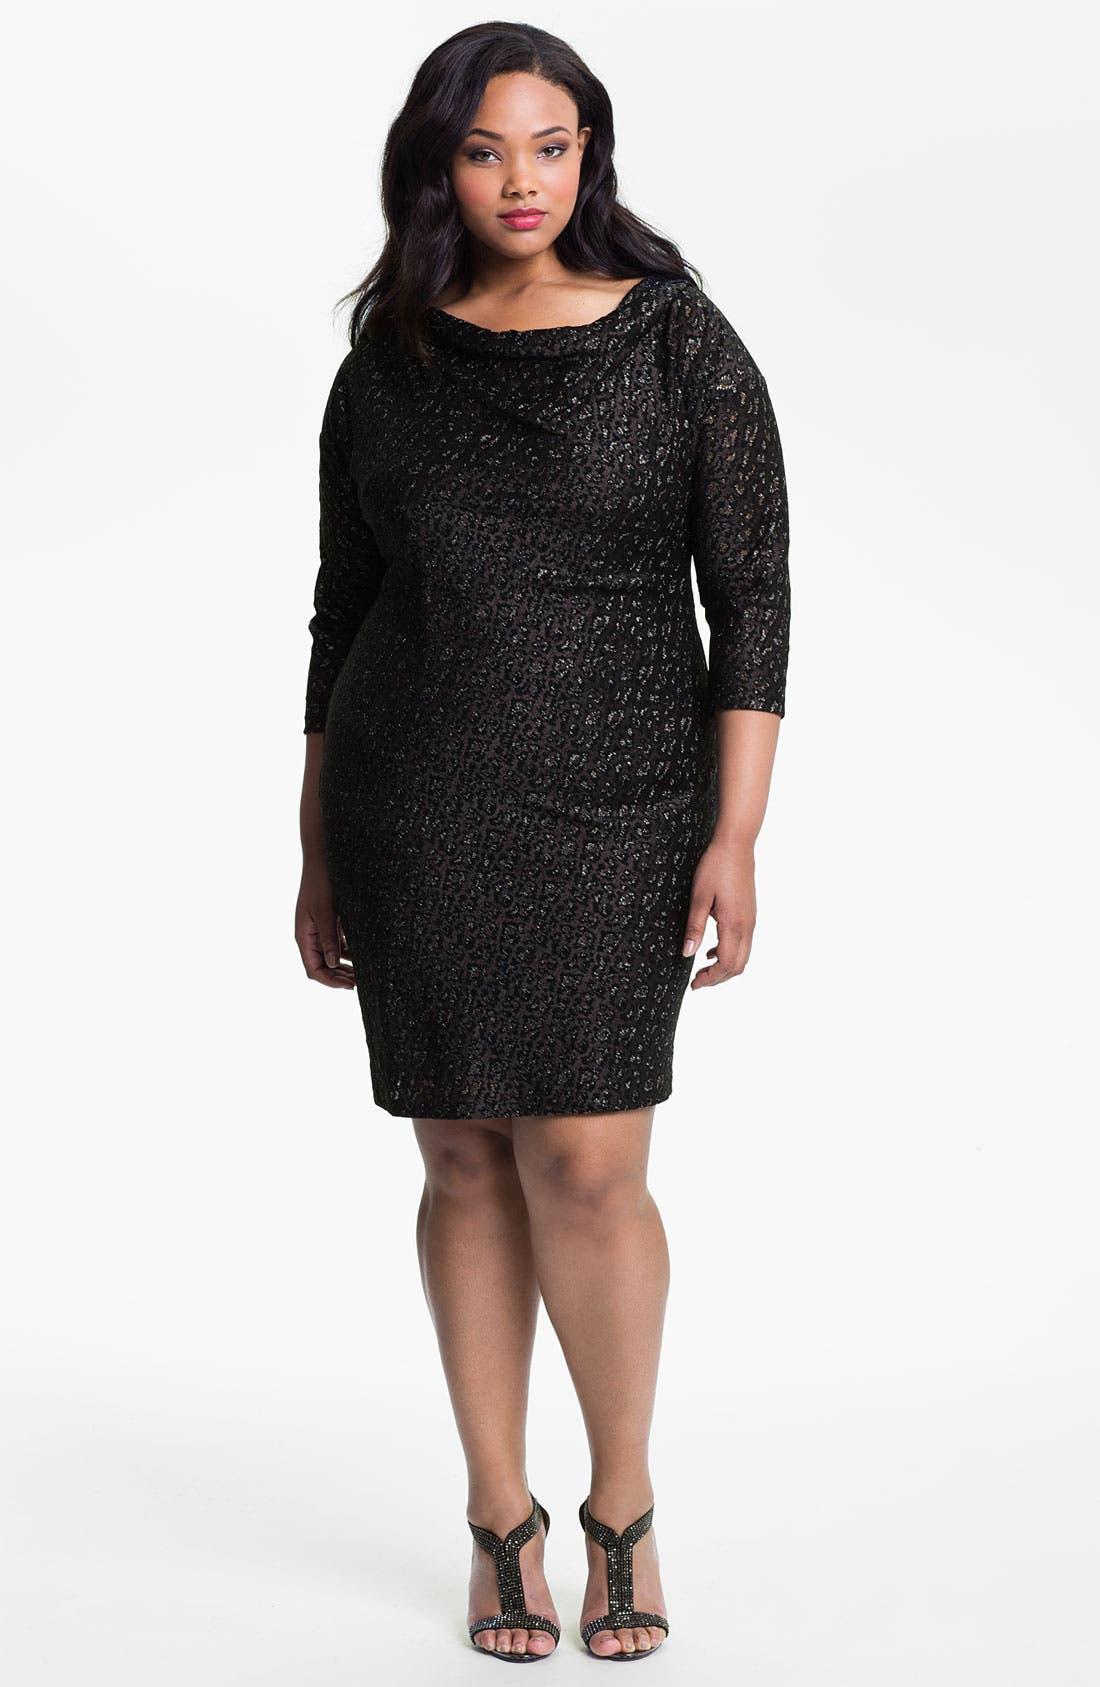 Alternate Image 1 Selected - Adrianna Papell Cowl Neck Metallic Jacquard Dress